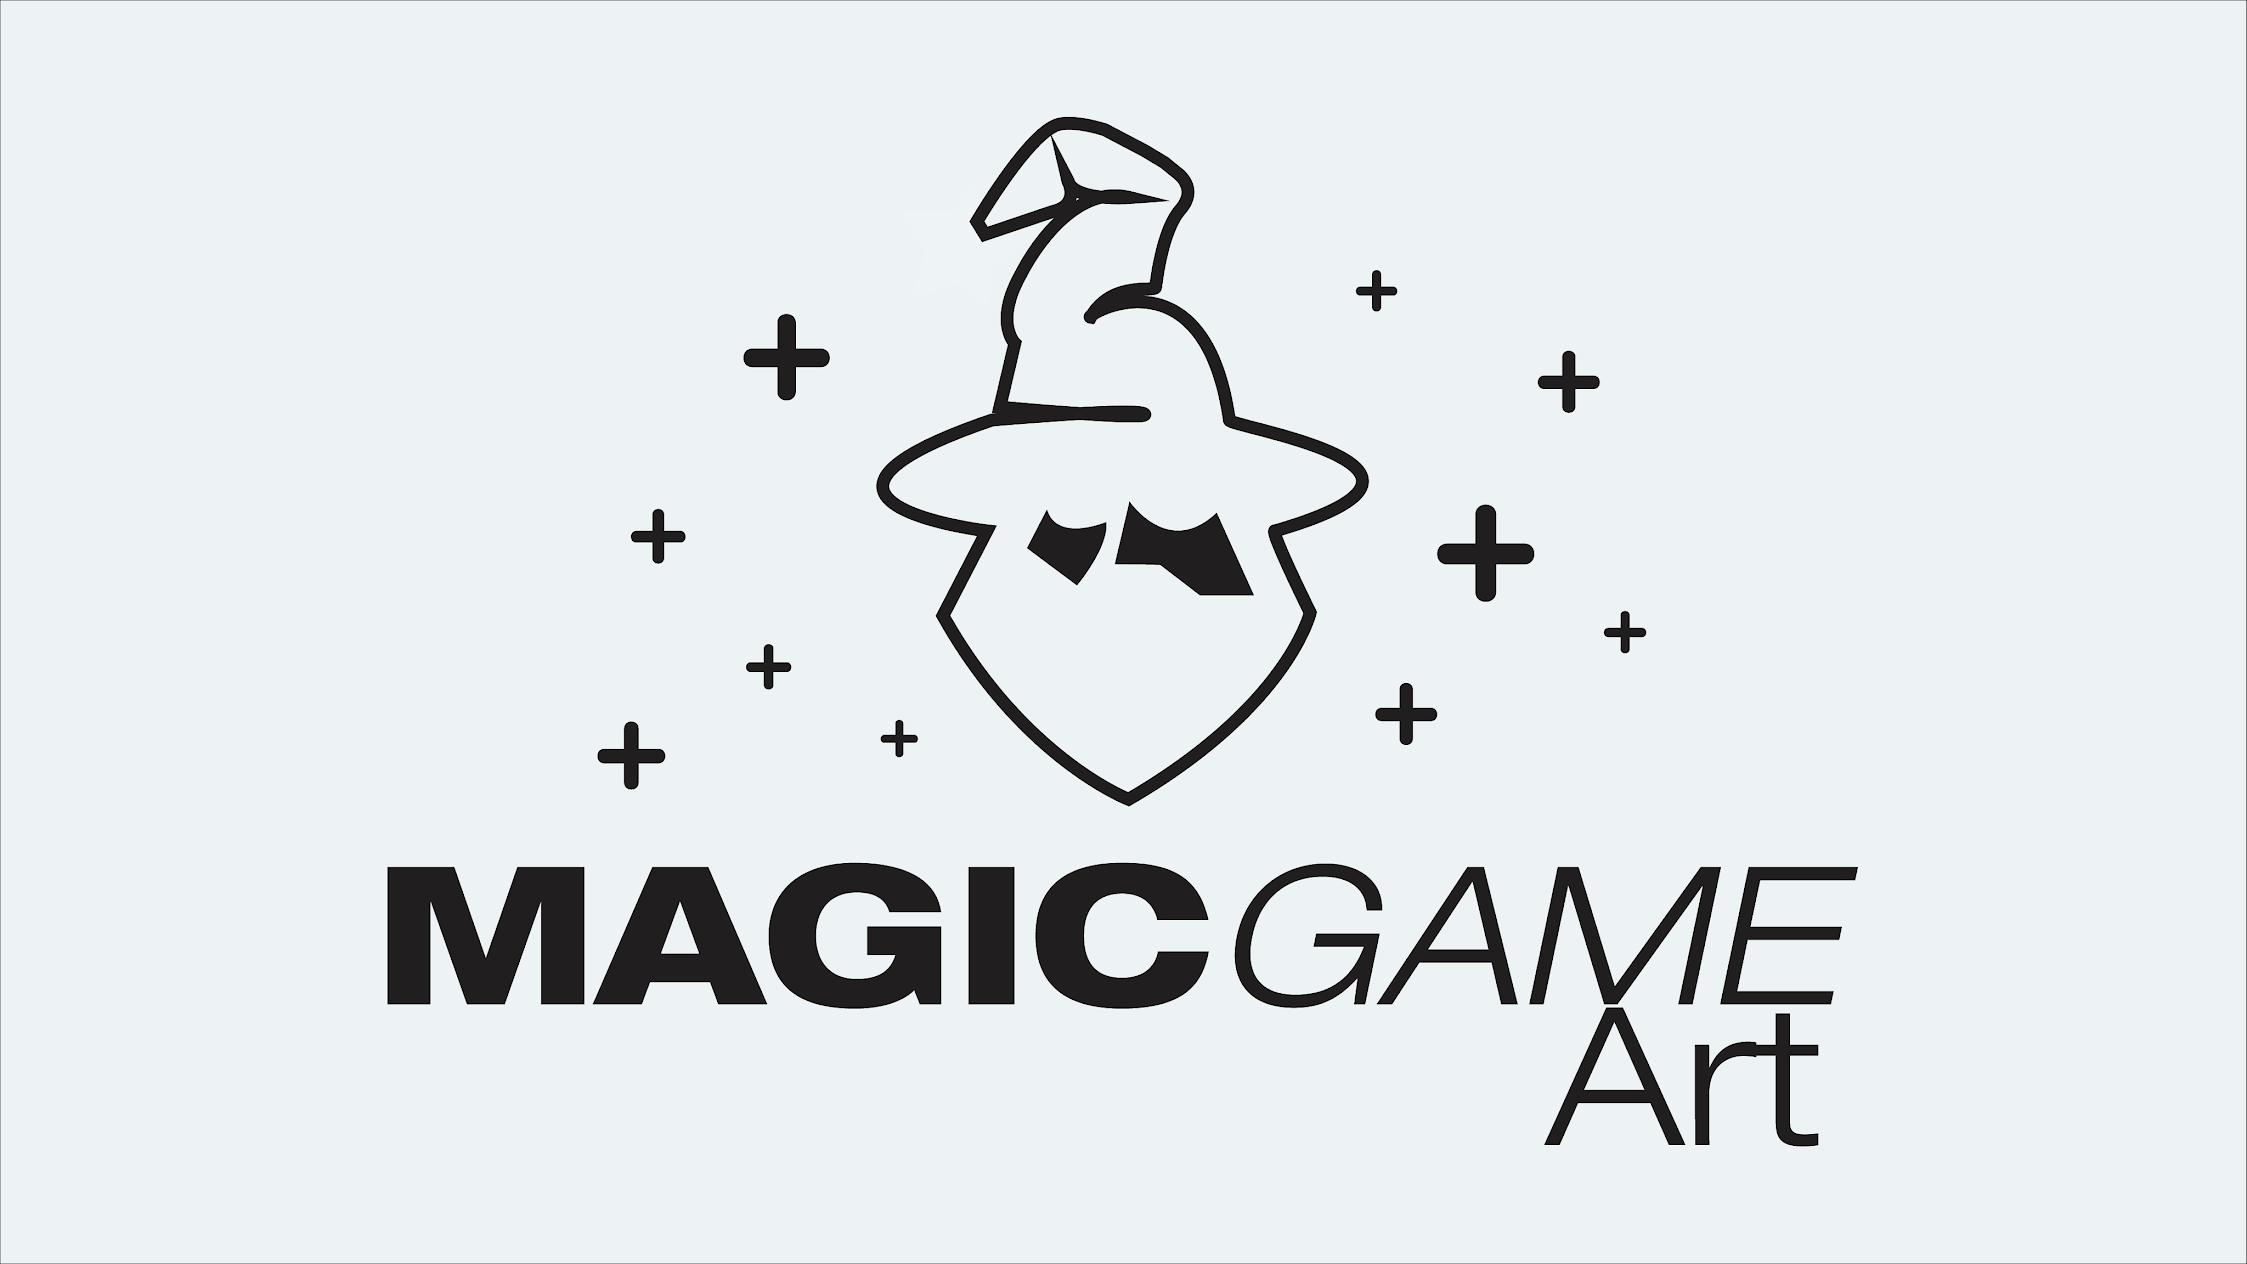 Magic Game Art